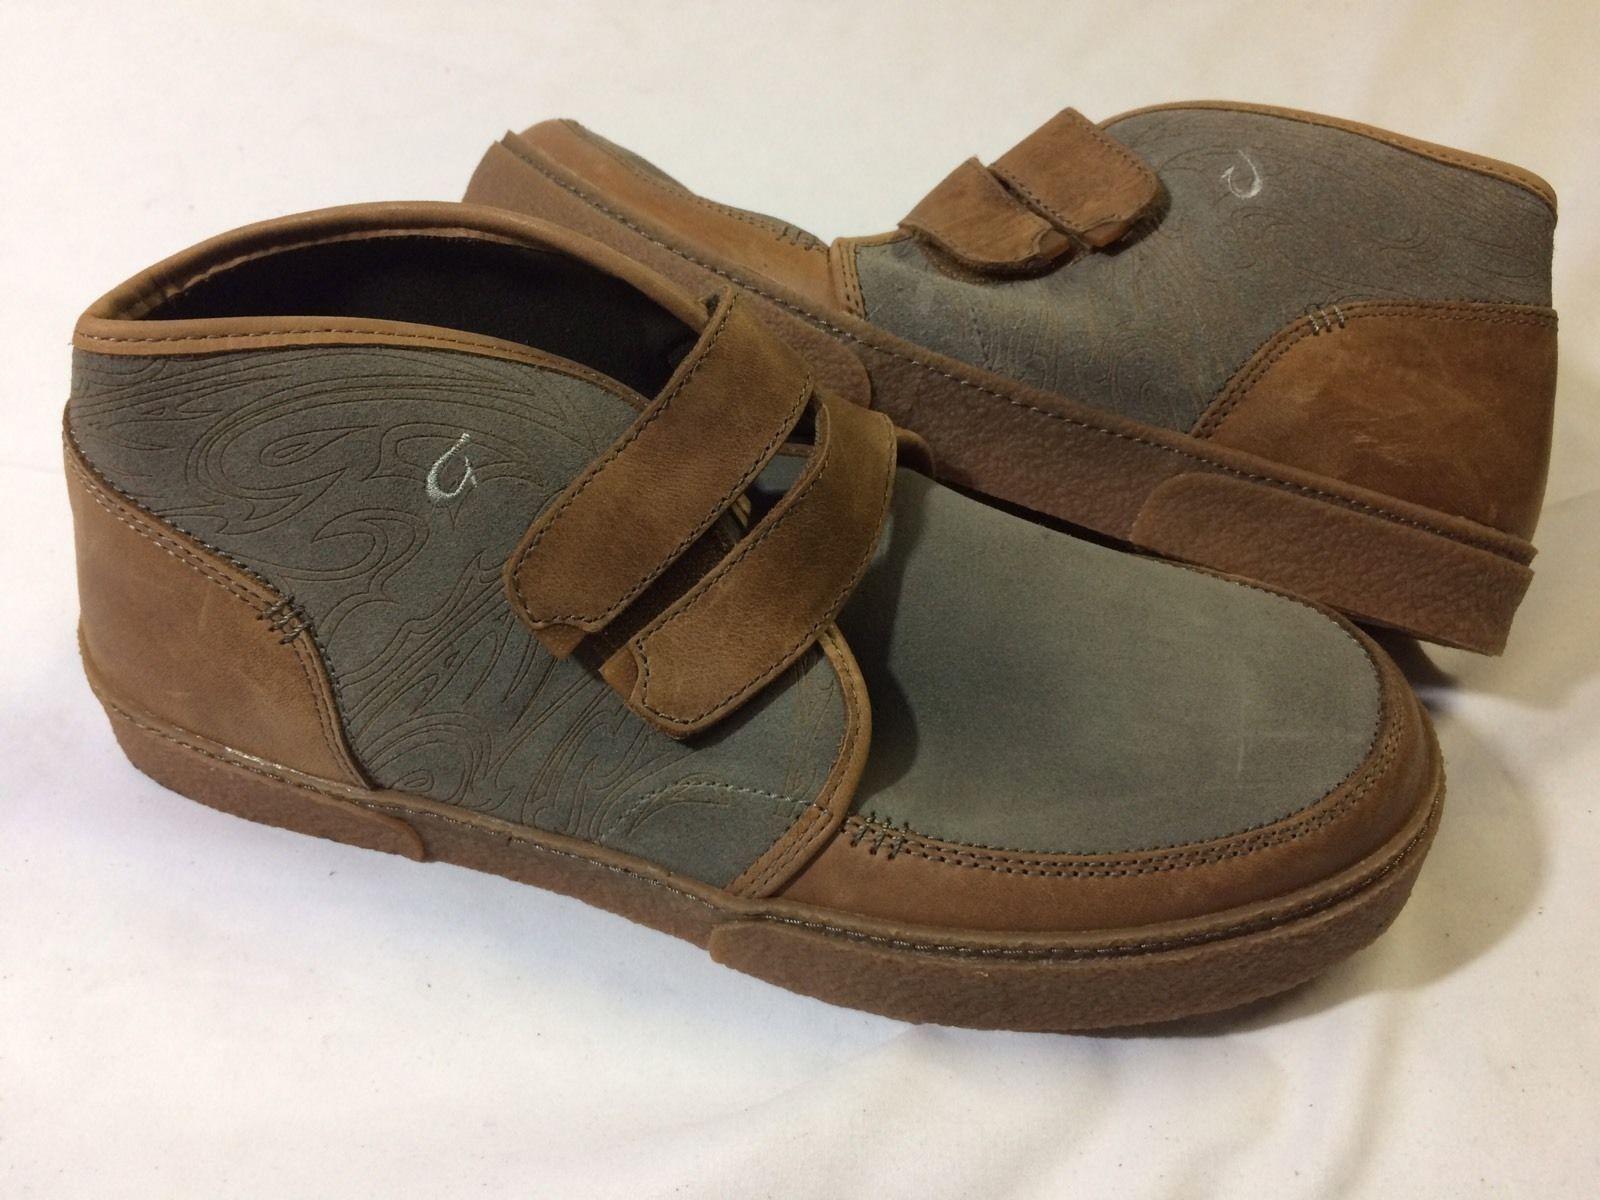 Olukai KAHA grau TAN MEN's Leather Stiefel Größe 8